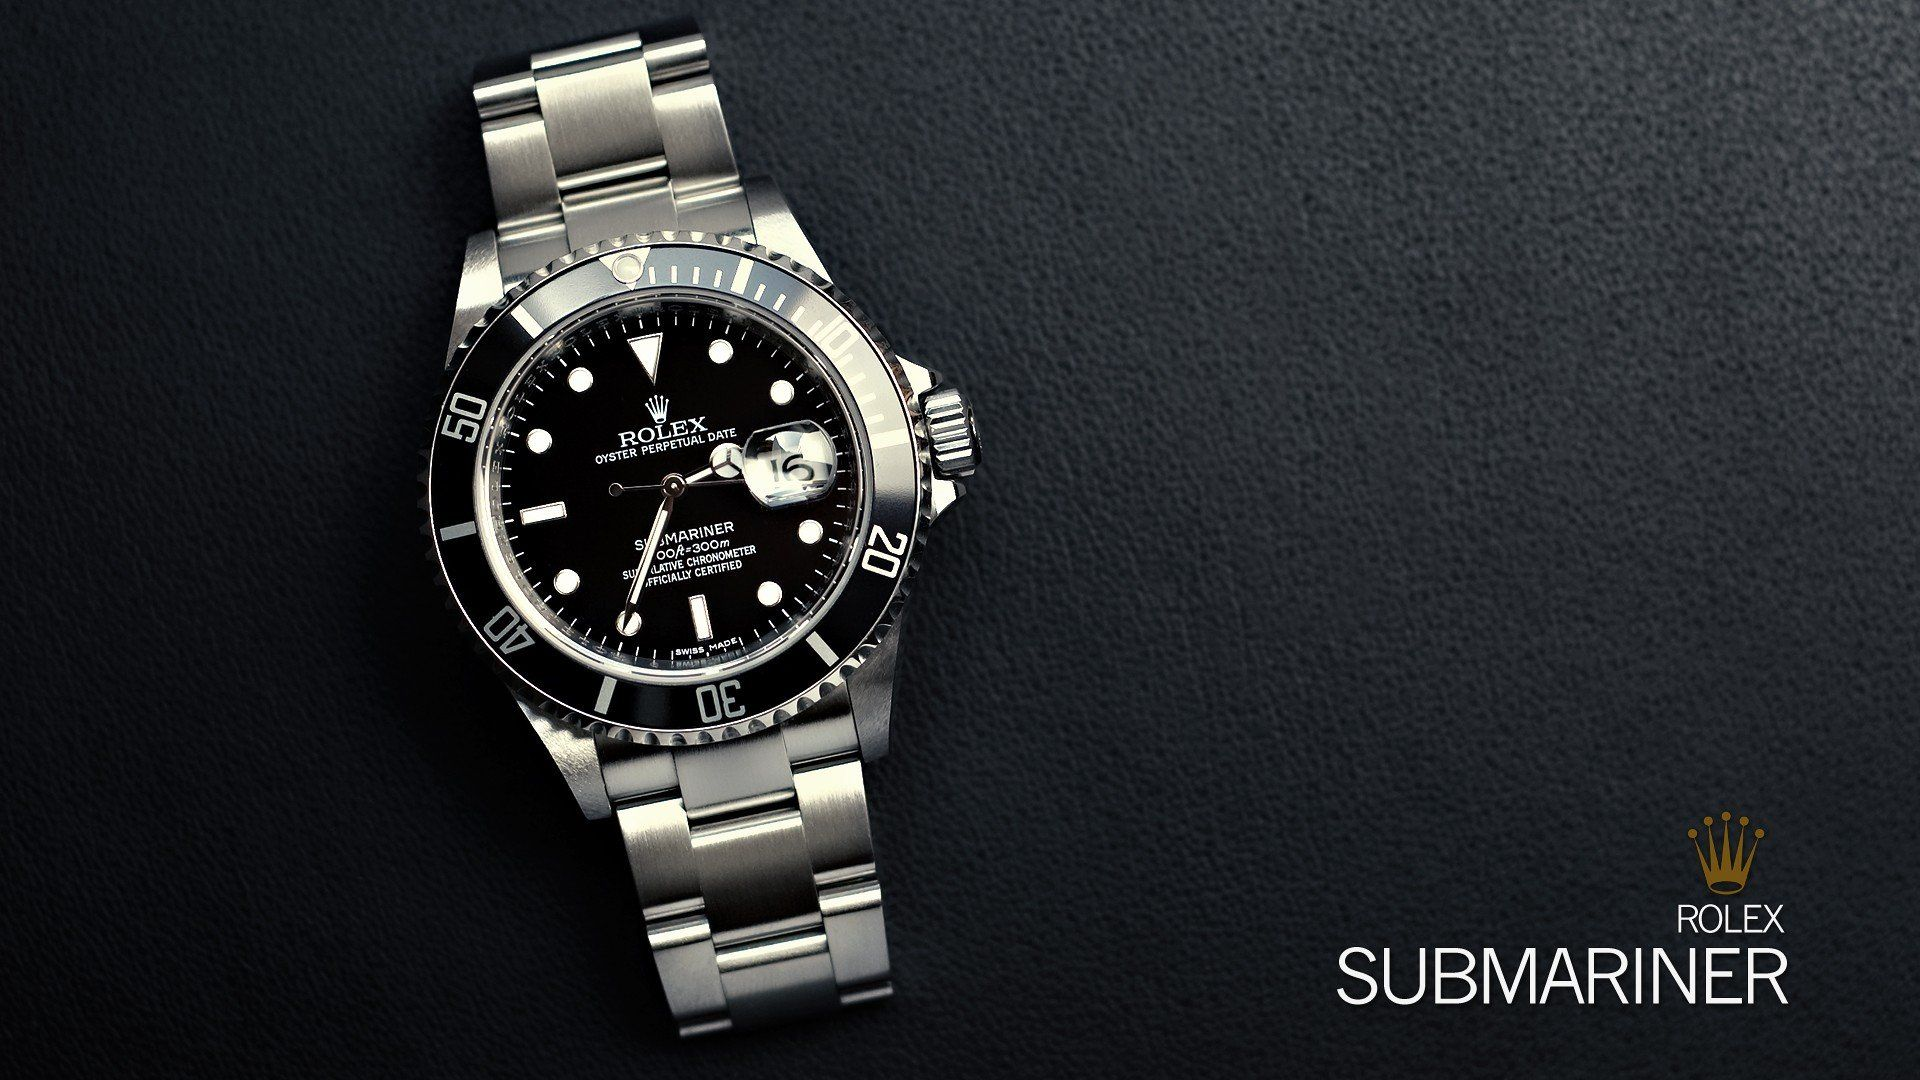 Rolex Watch Wallpapers - Top Free Rolex